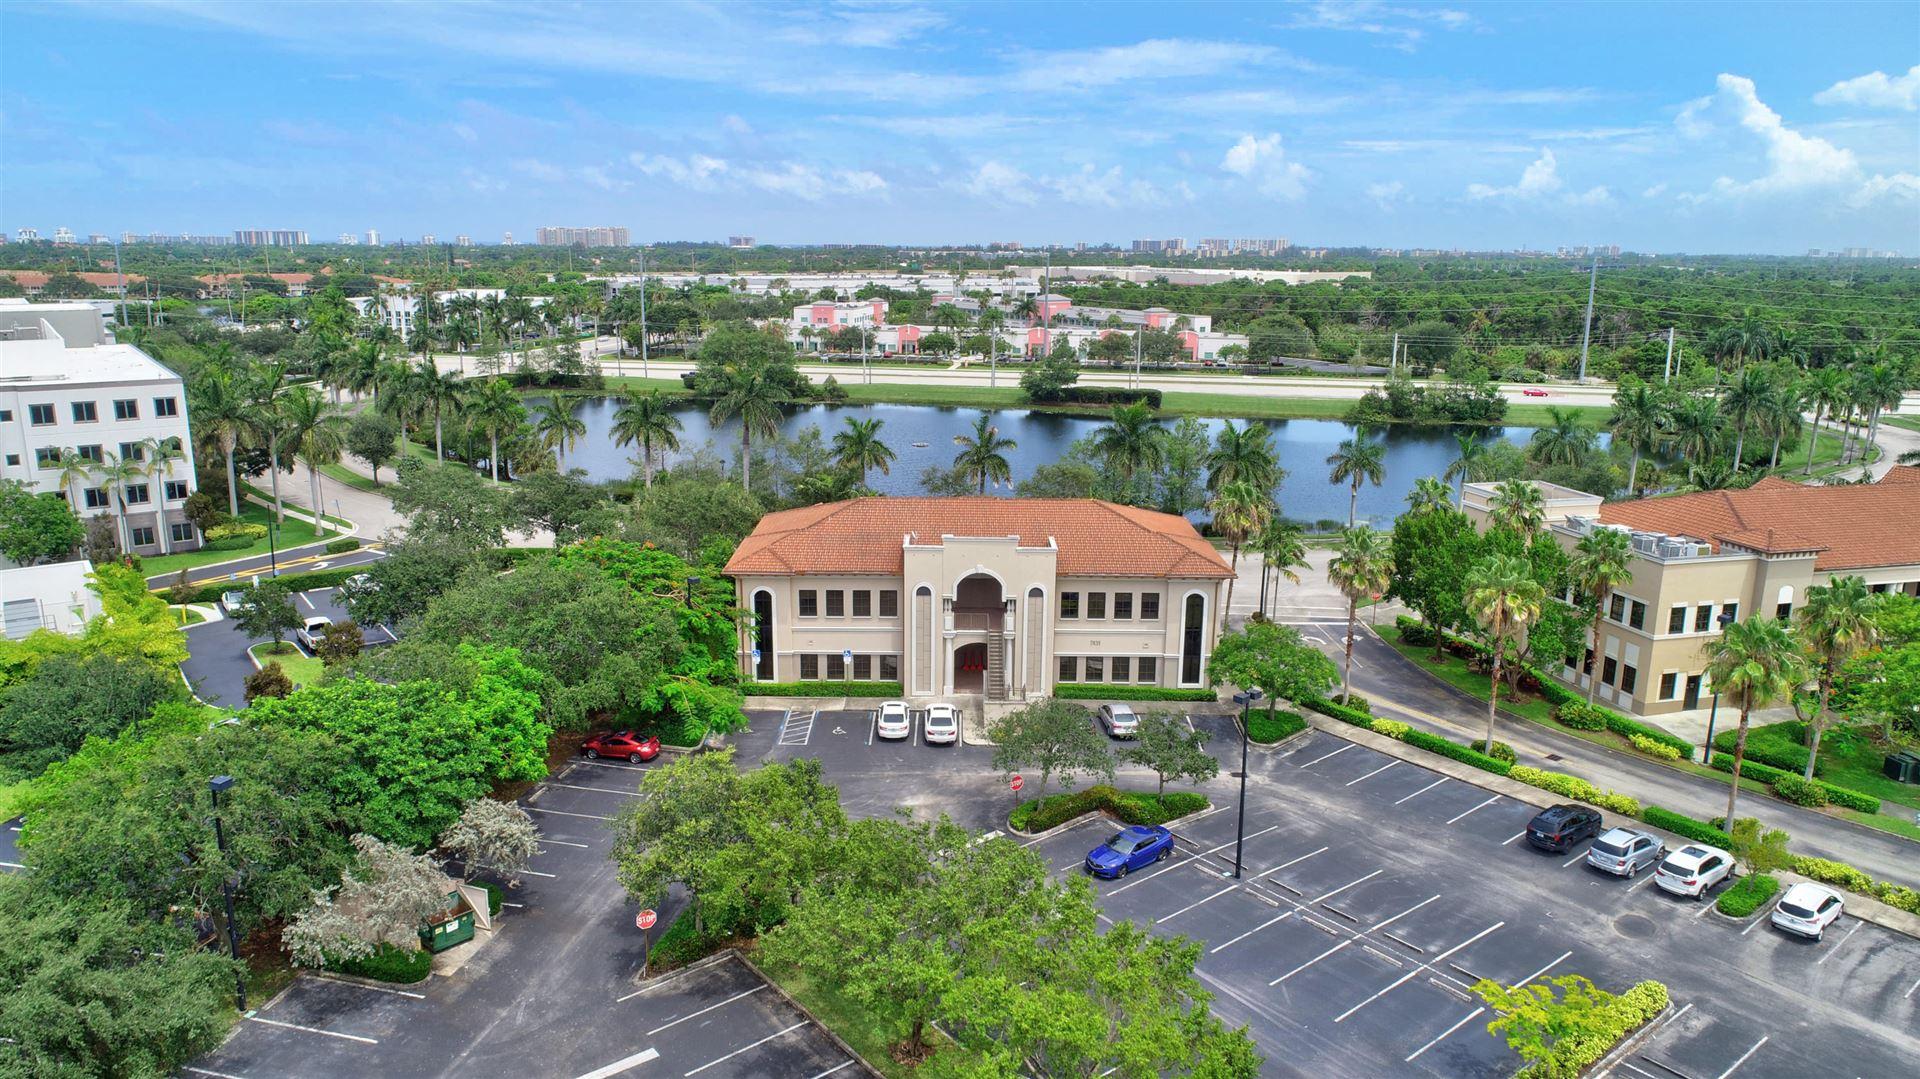 Photo of 7835 NW Becon Square Boulevard, Boca Raton, FL 33487 (MLS # RX-10633318)